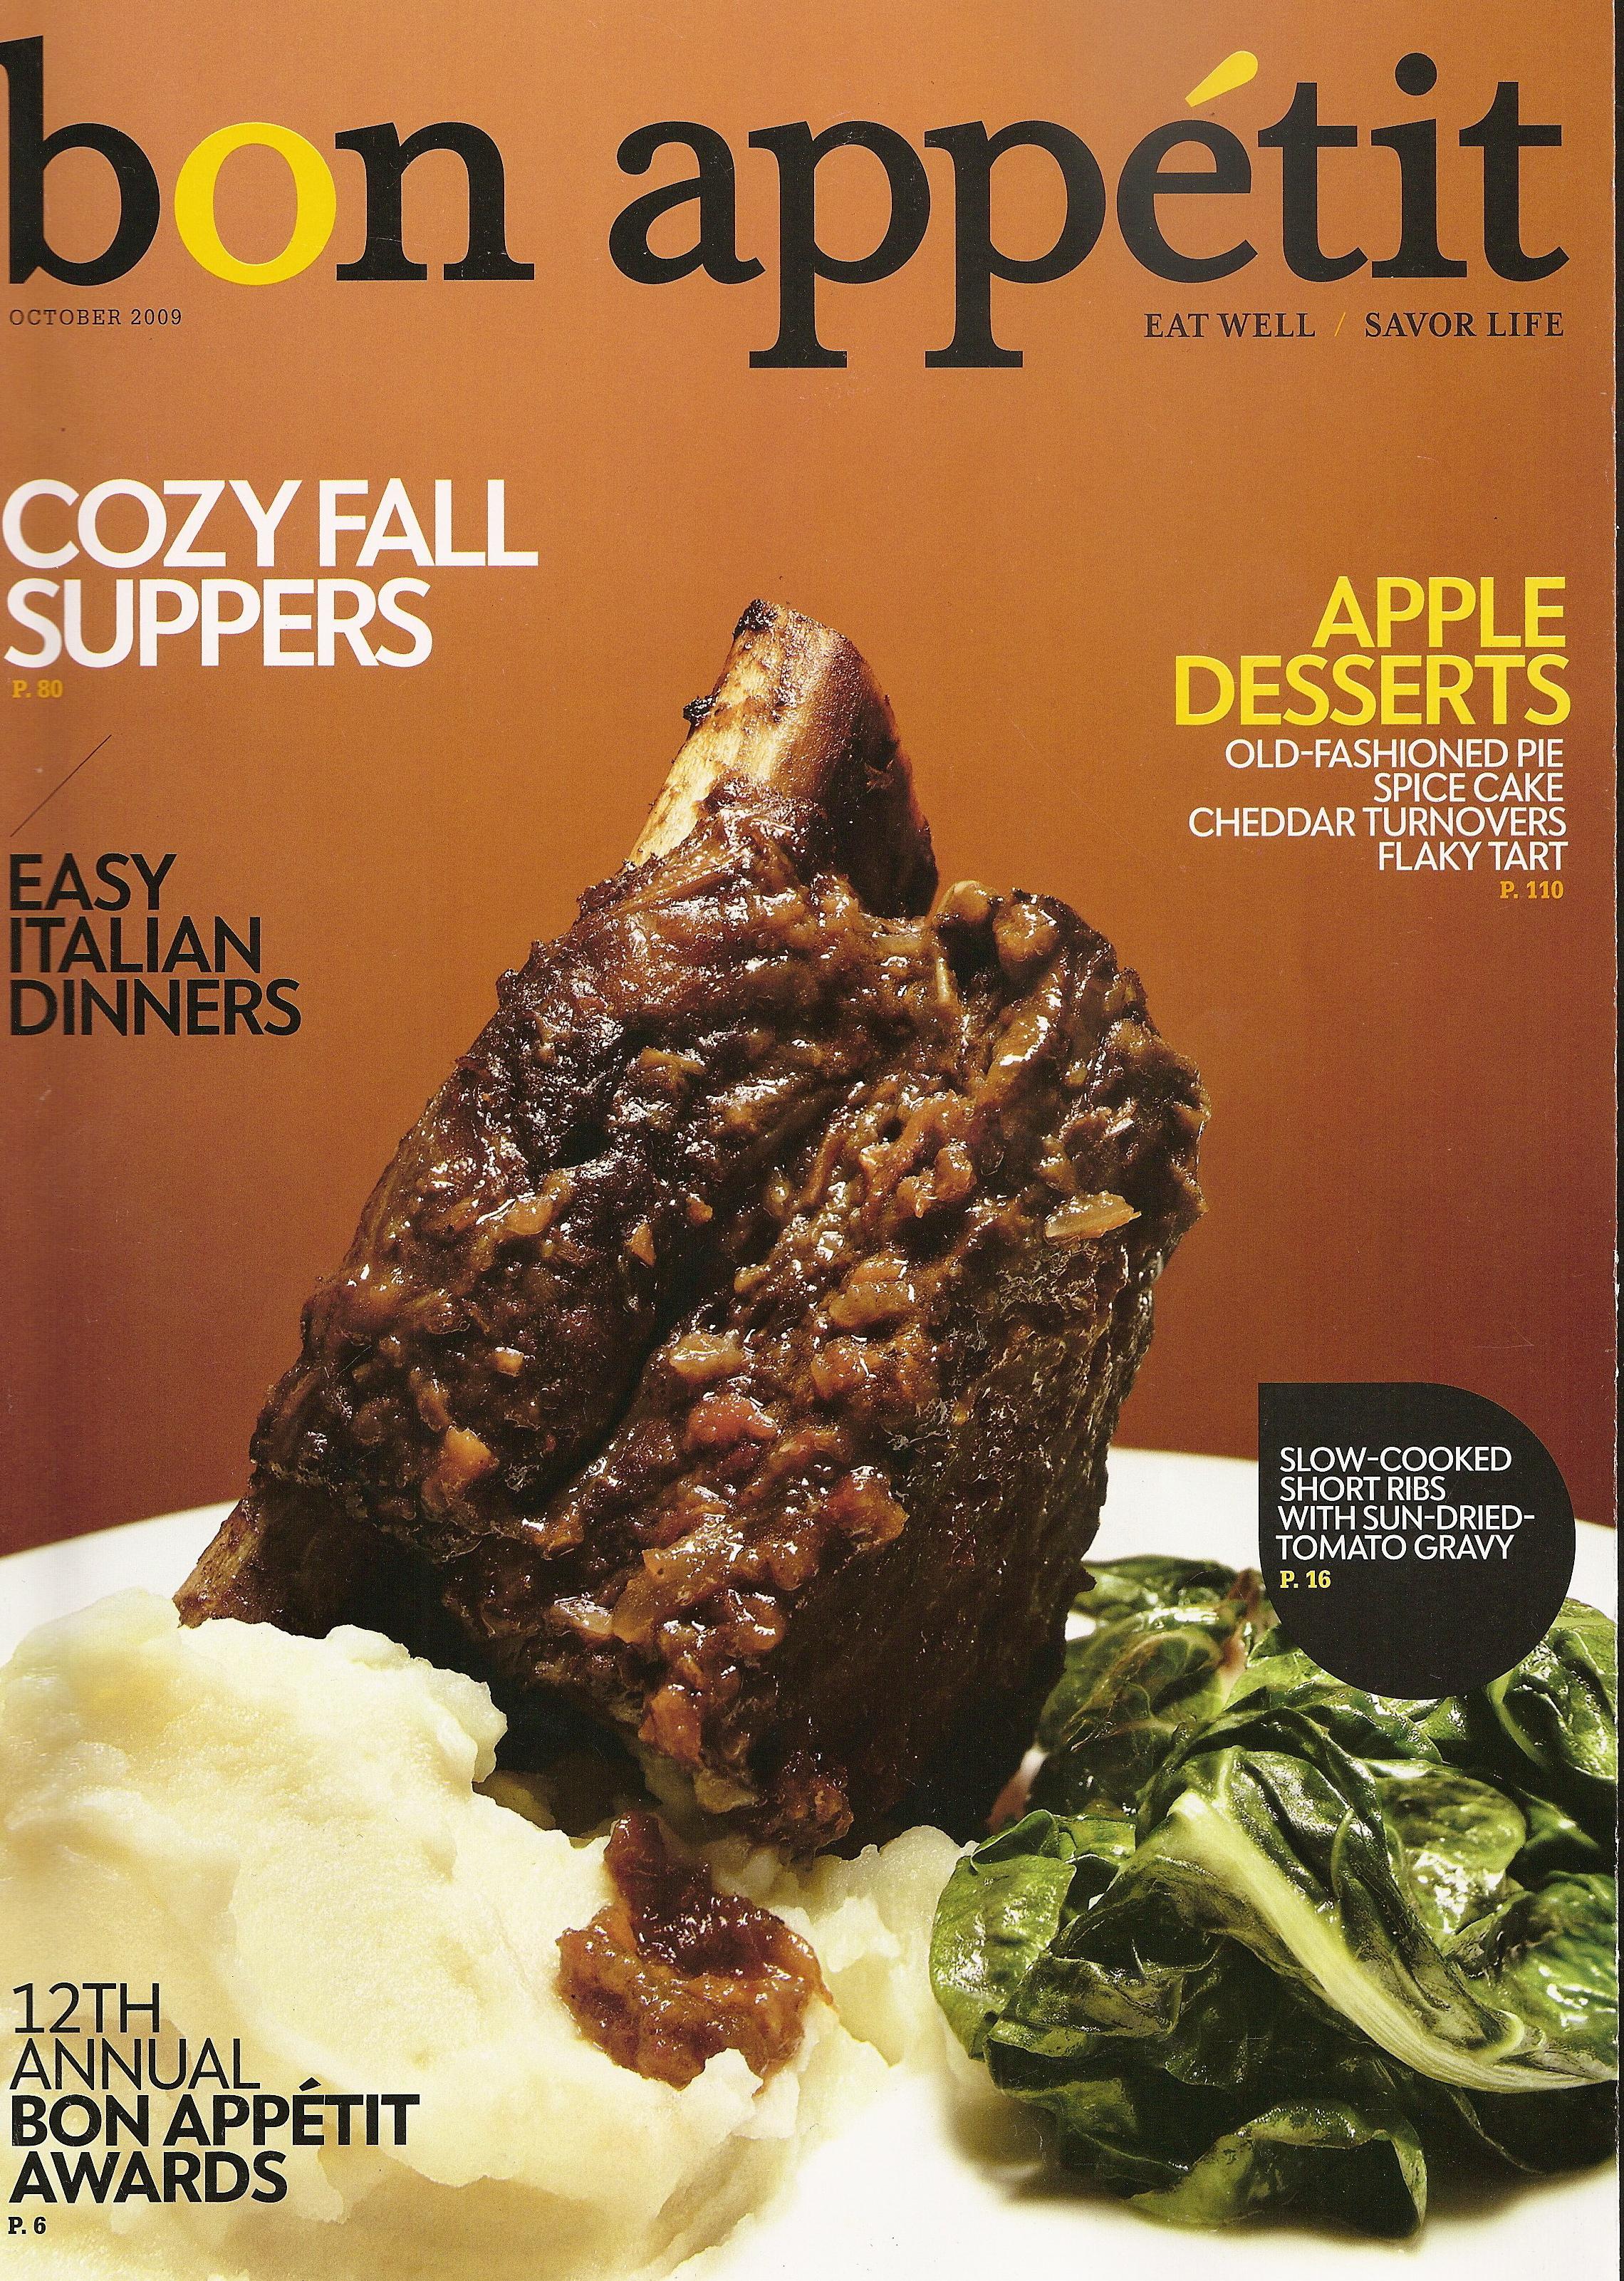 Bon Appetit Cover - Kogi BBQ Taco Truck & Catering